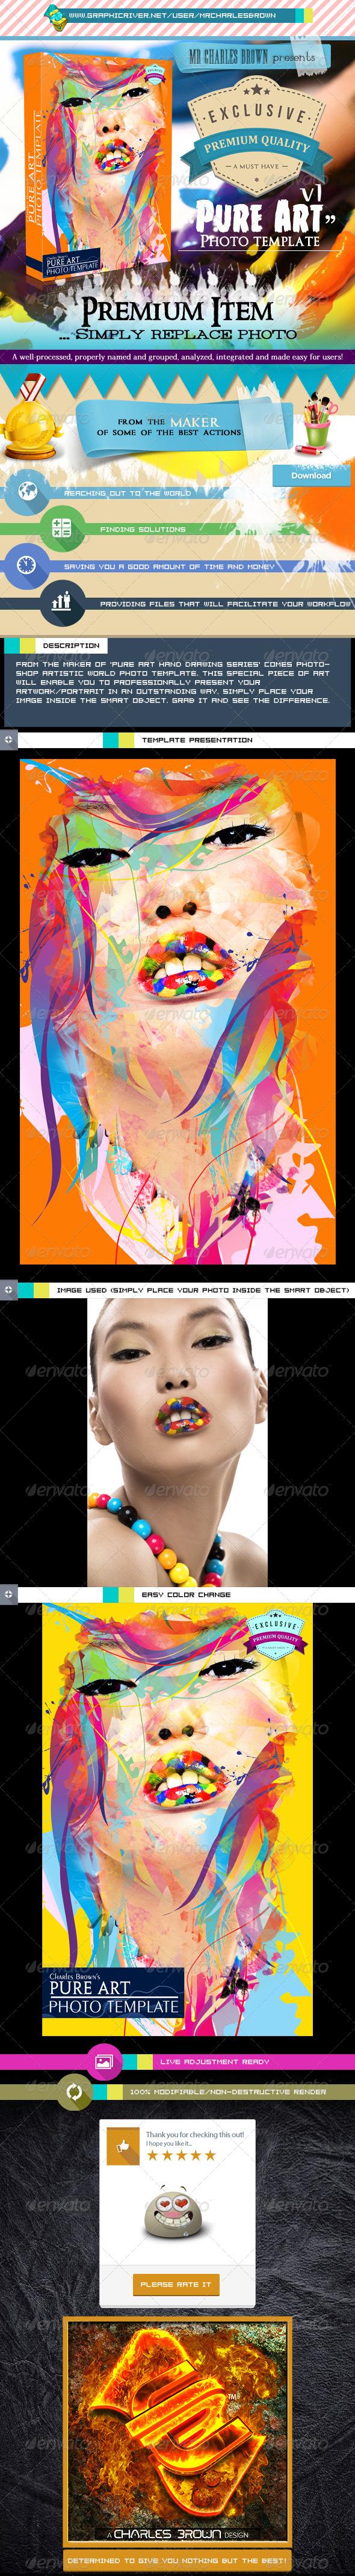 Pure Art Photo Template v1 - Photo Templates Graphics